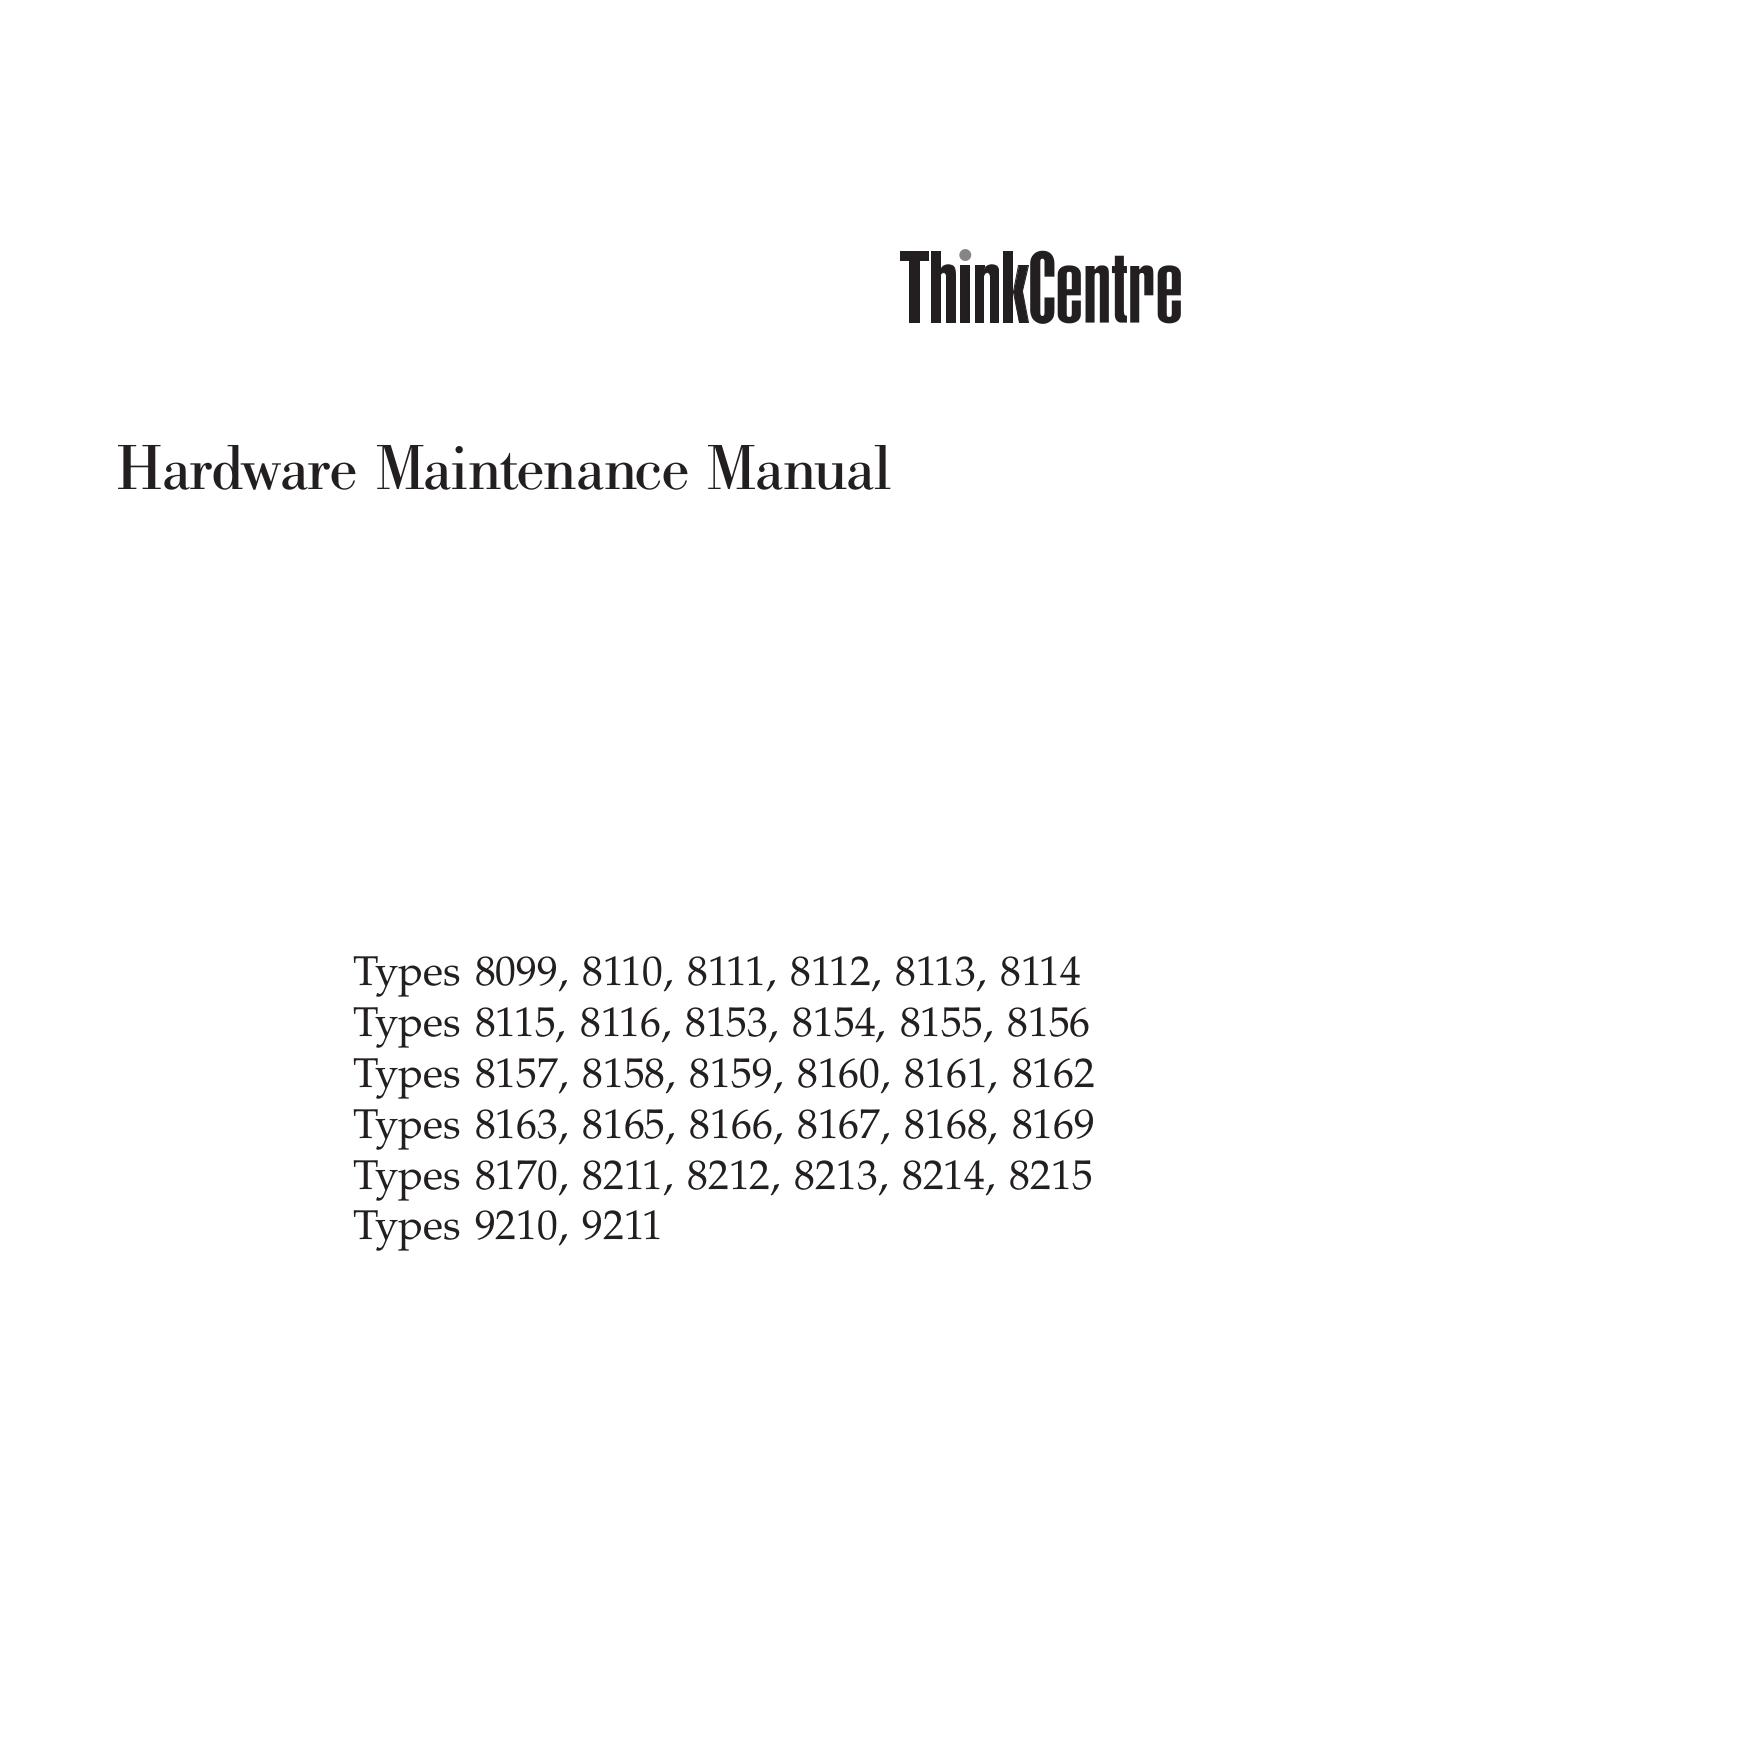 pdf for Lenovo Desktop ThinkCentre M52 8099 manual